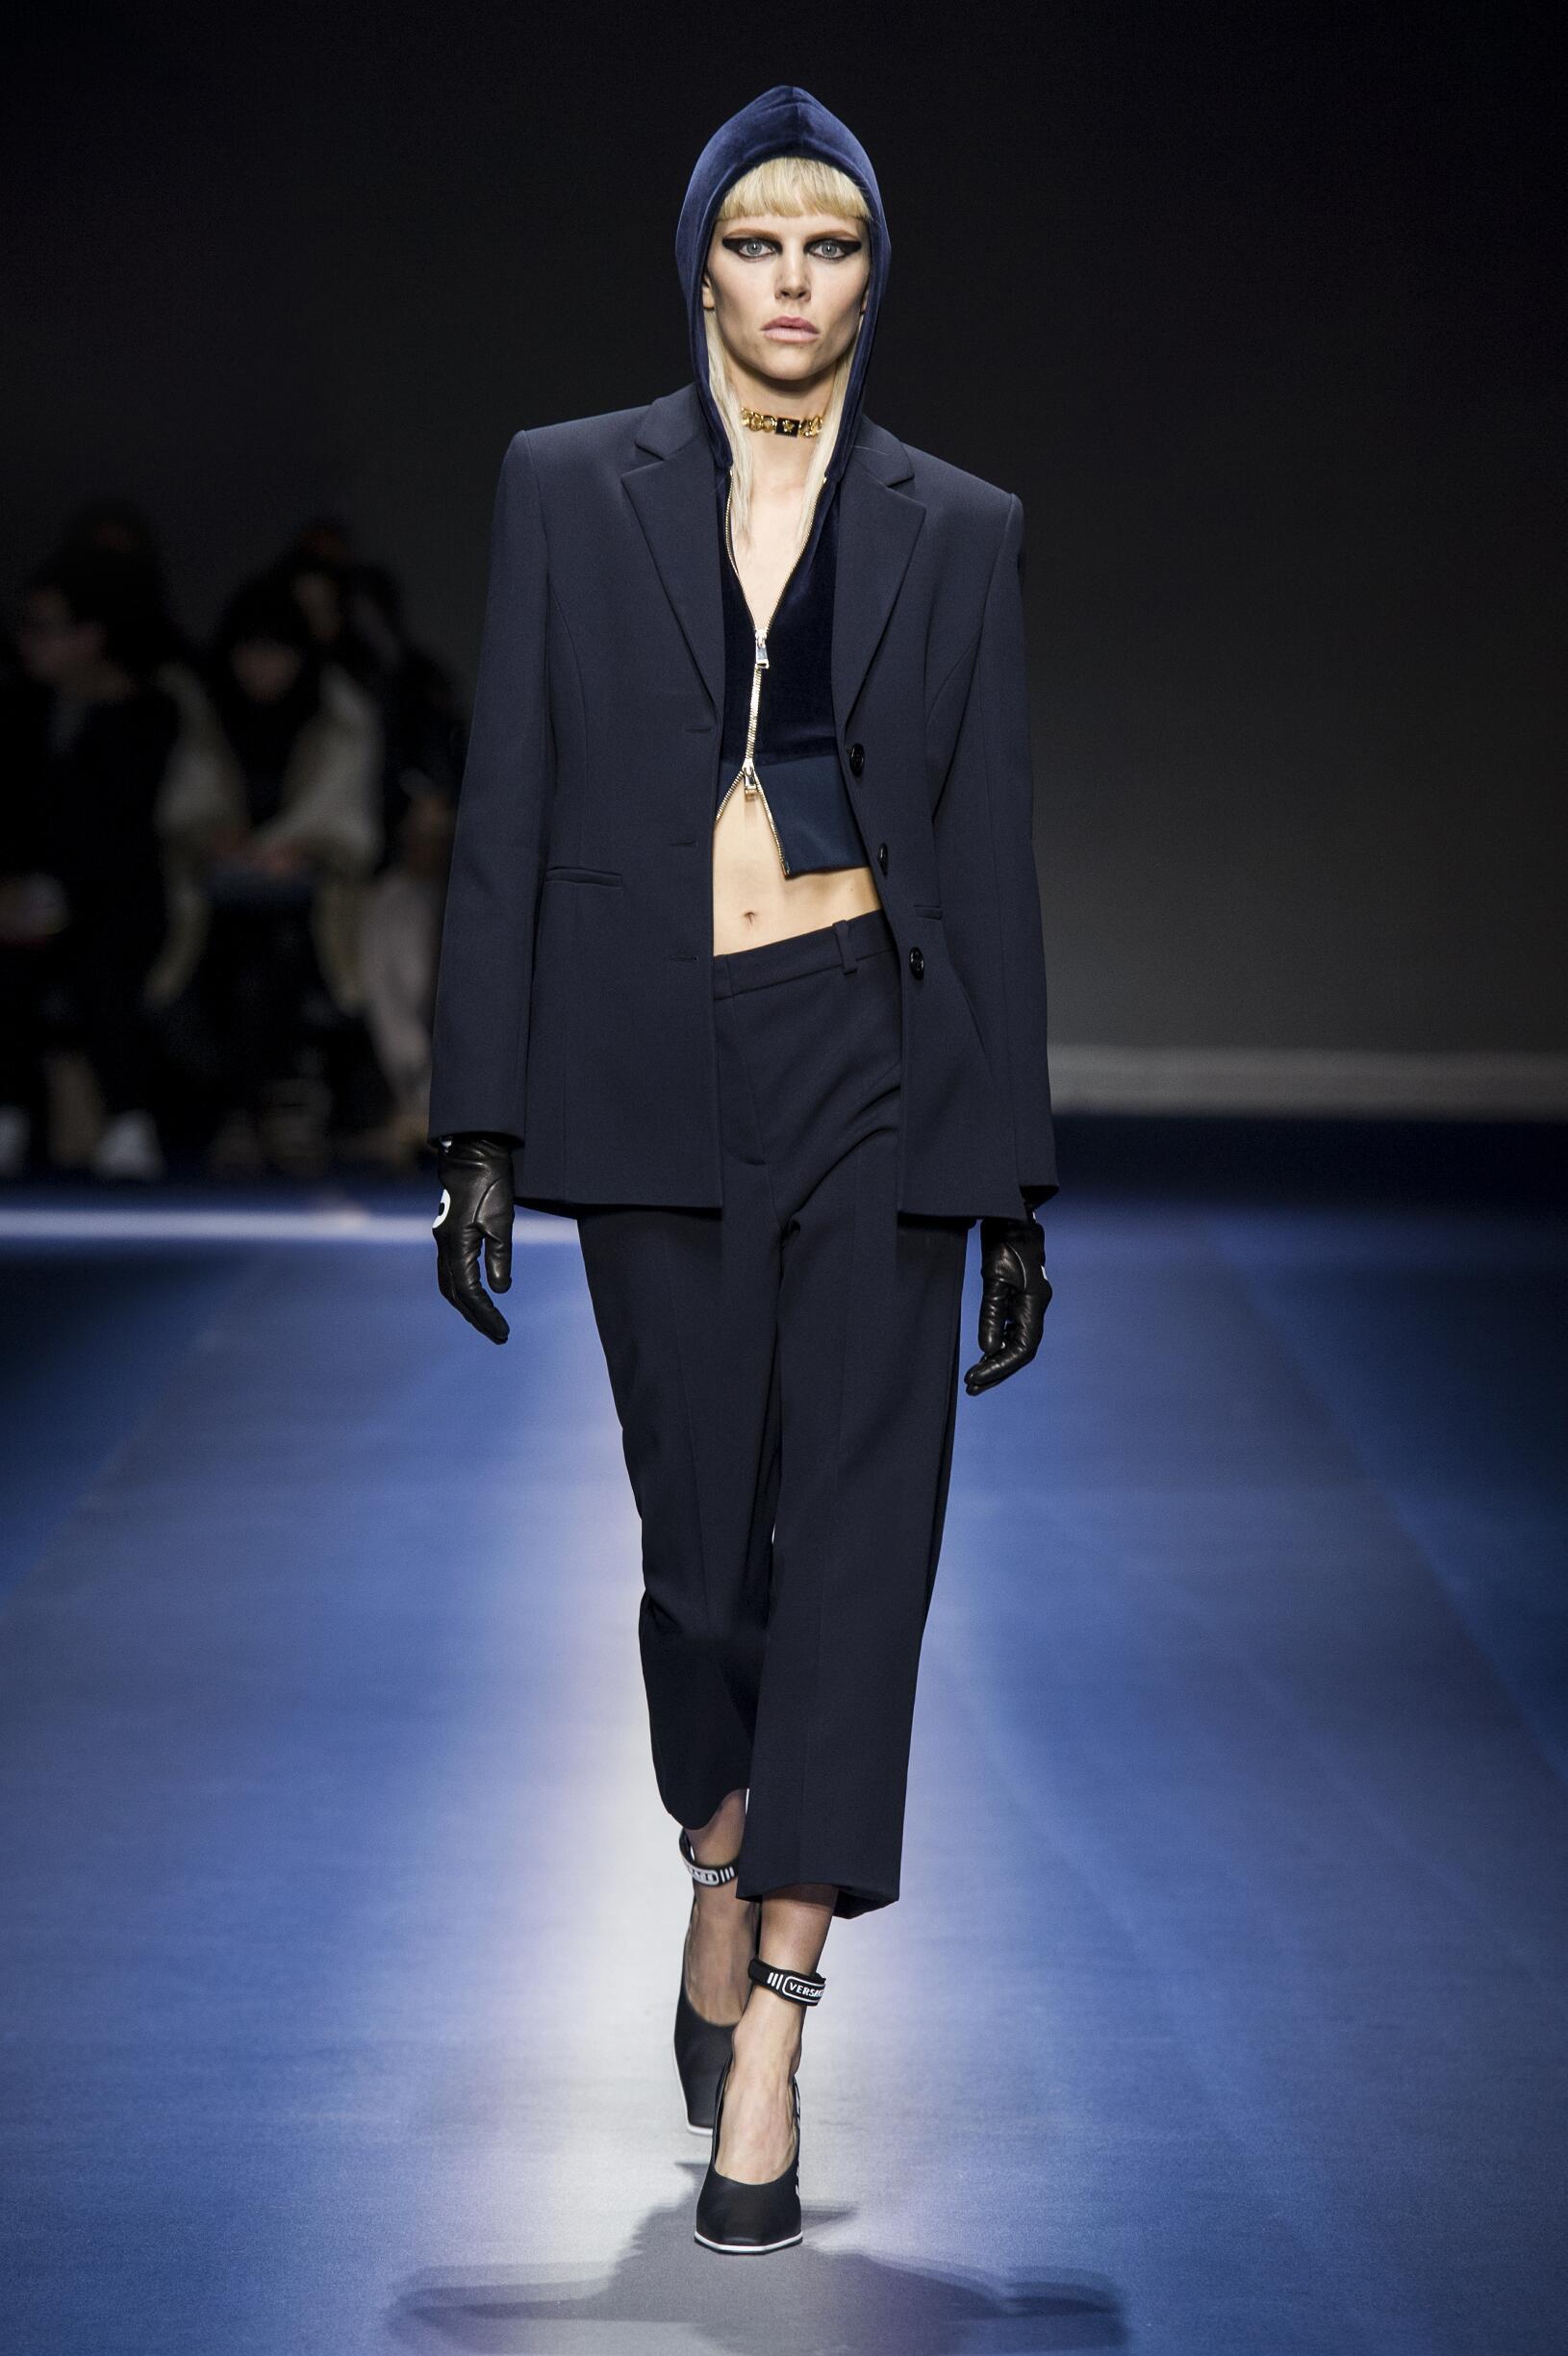 Fashion Woman Model Versace Catwalk 17-18